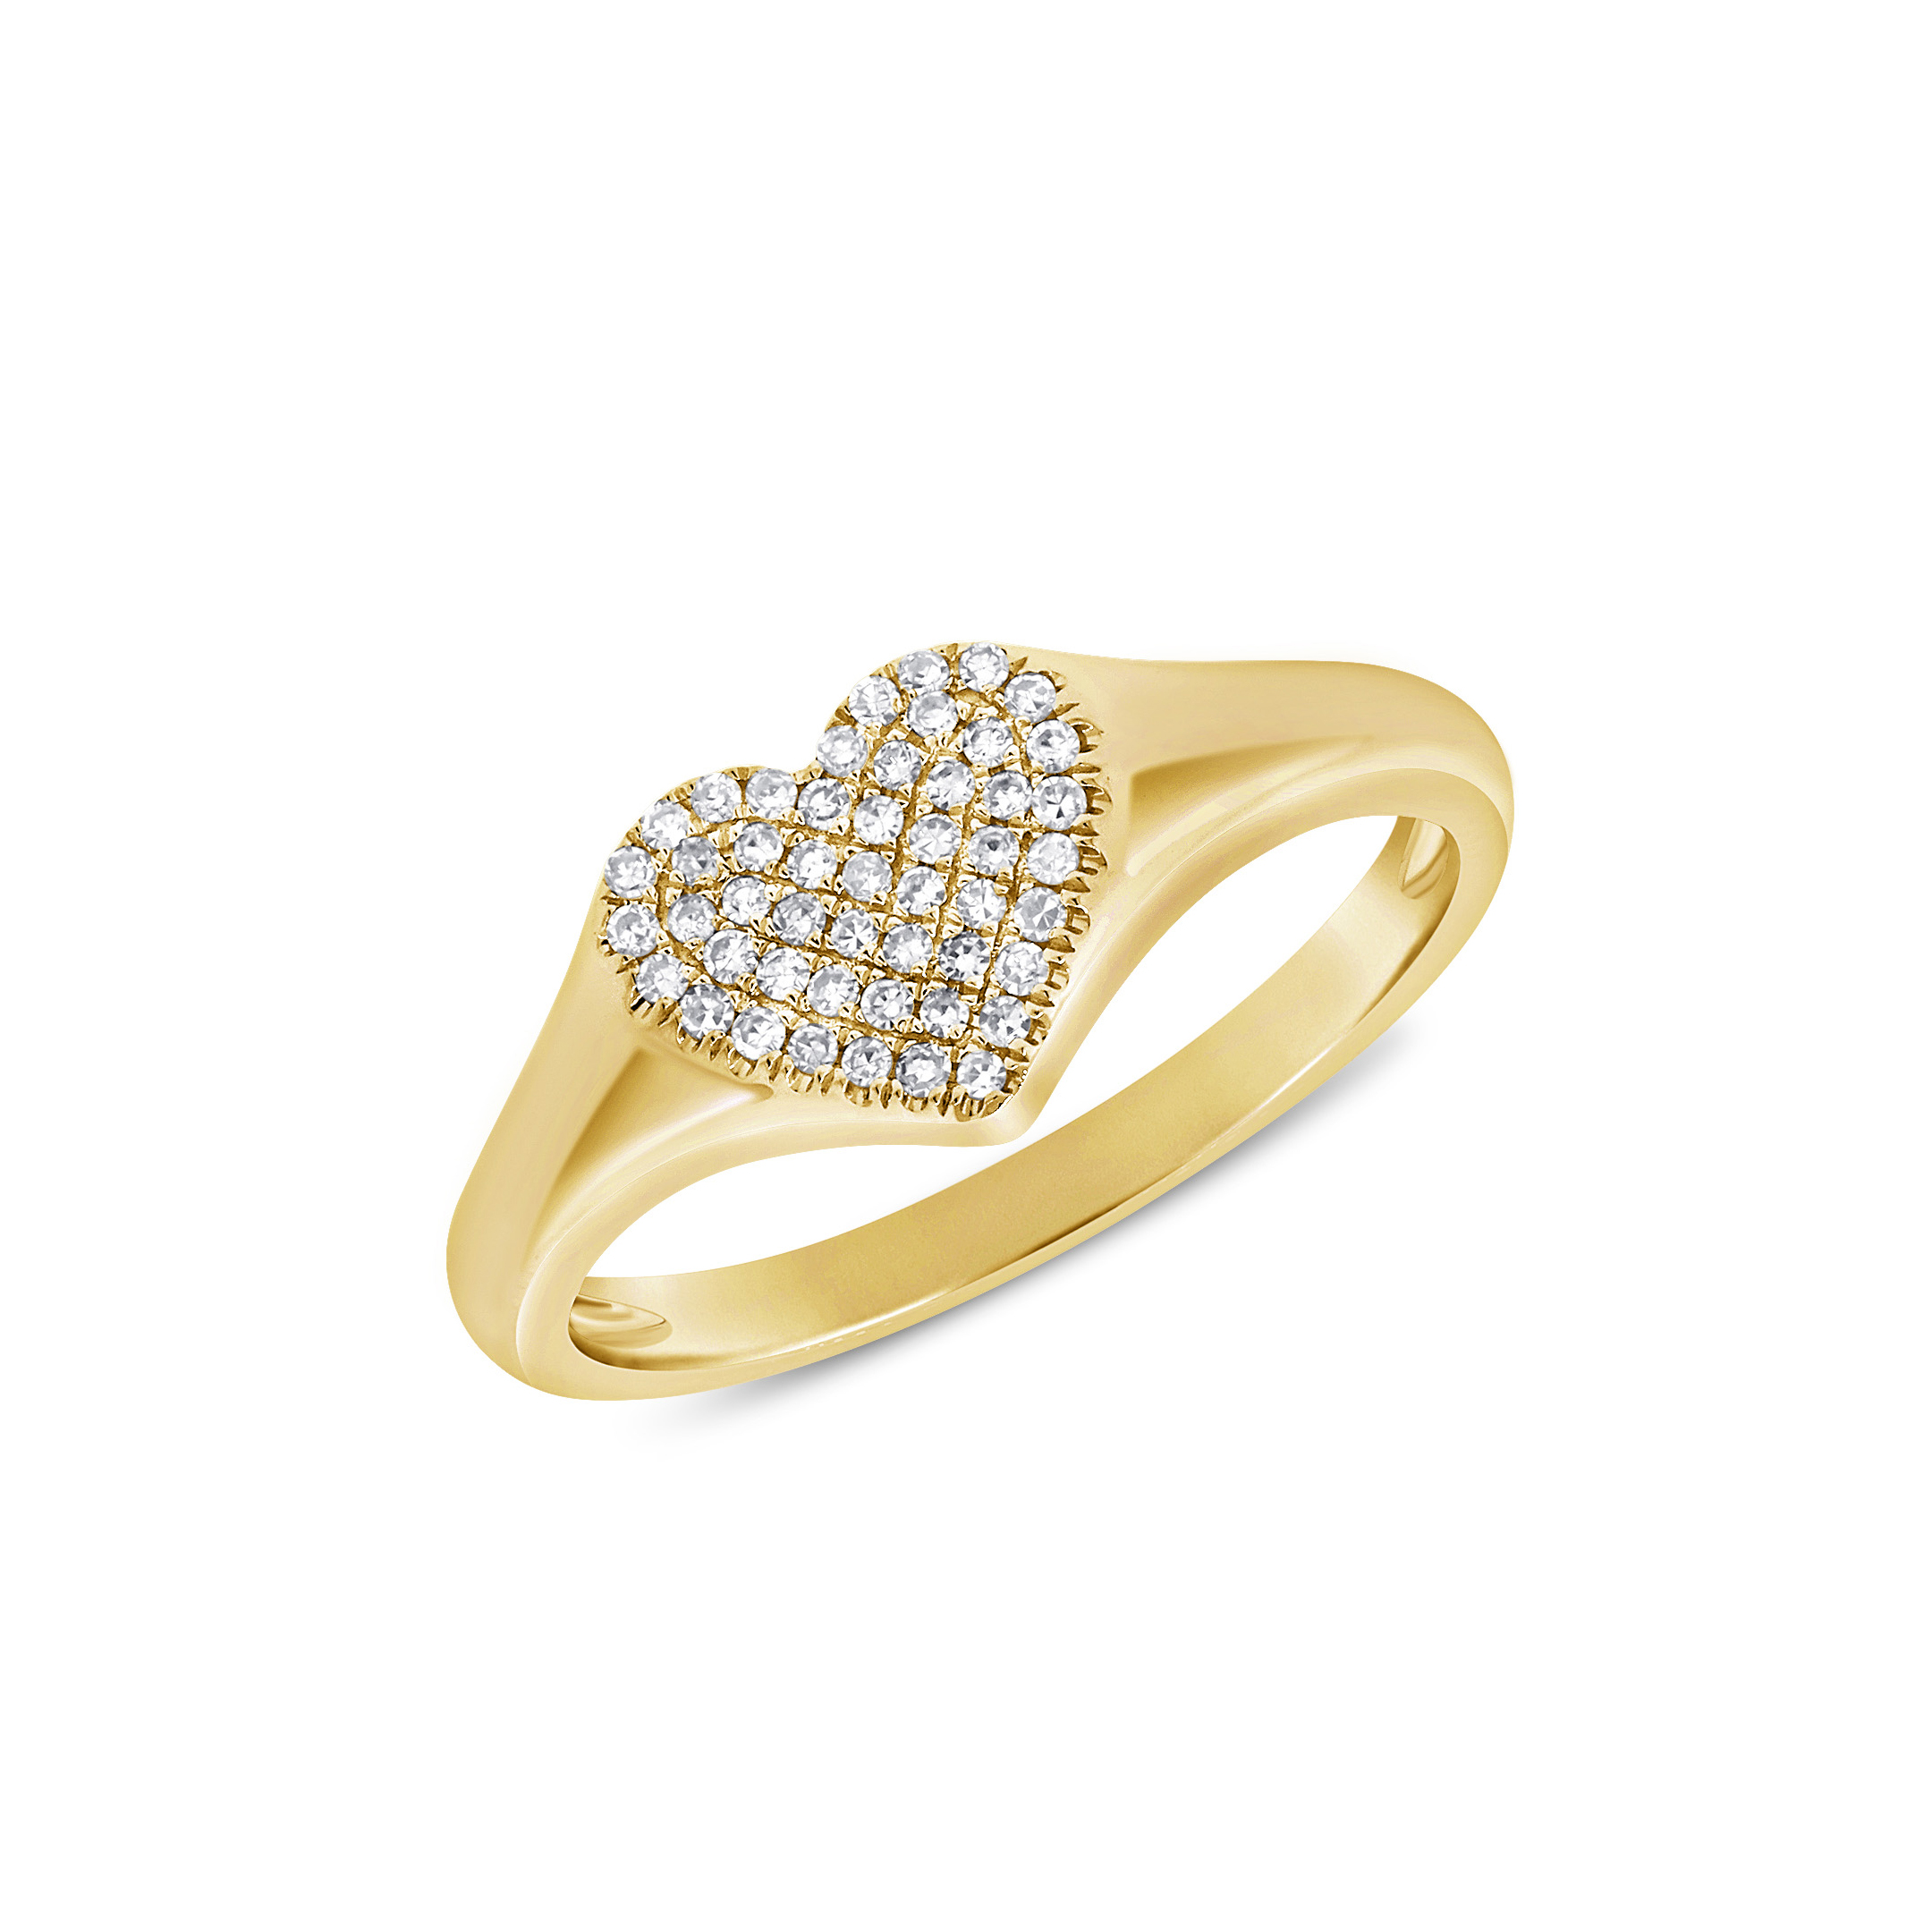 heart shaped pave diamond center band in 14 karat yellow gold